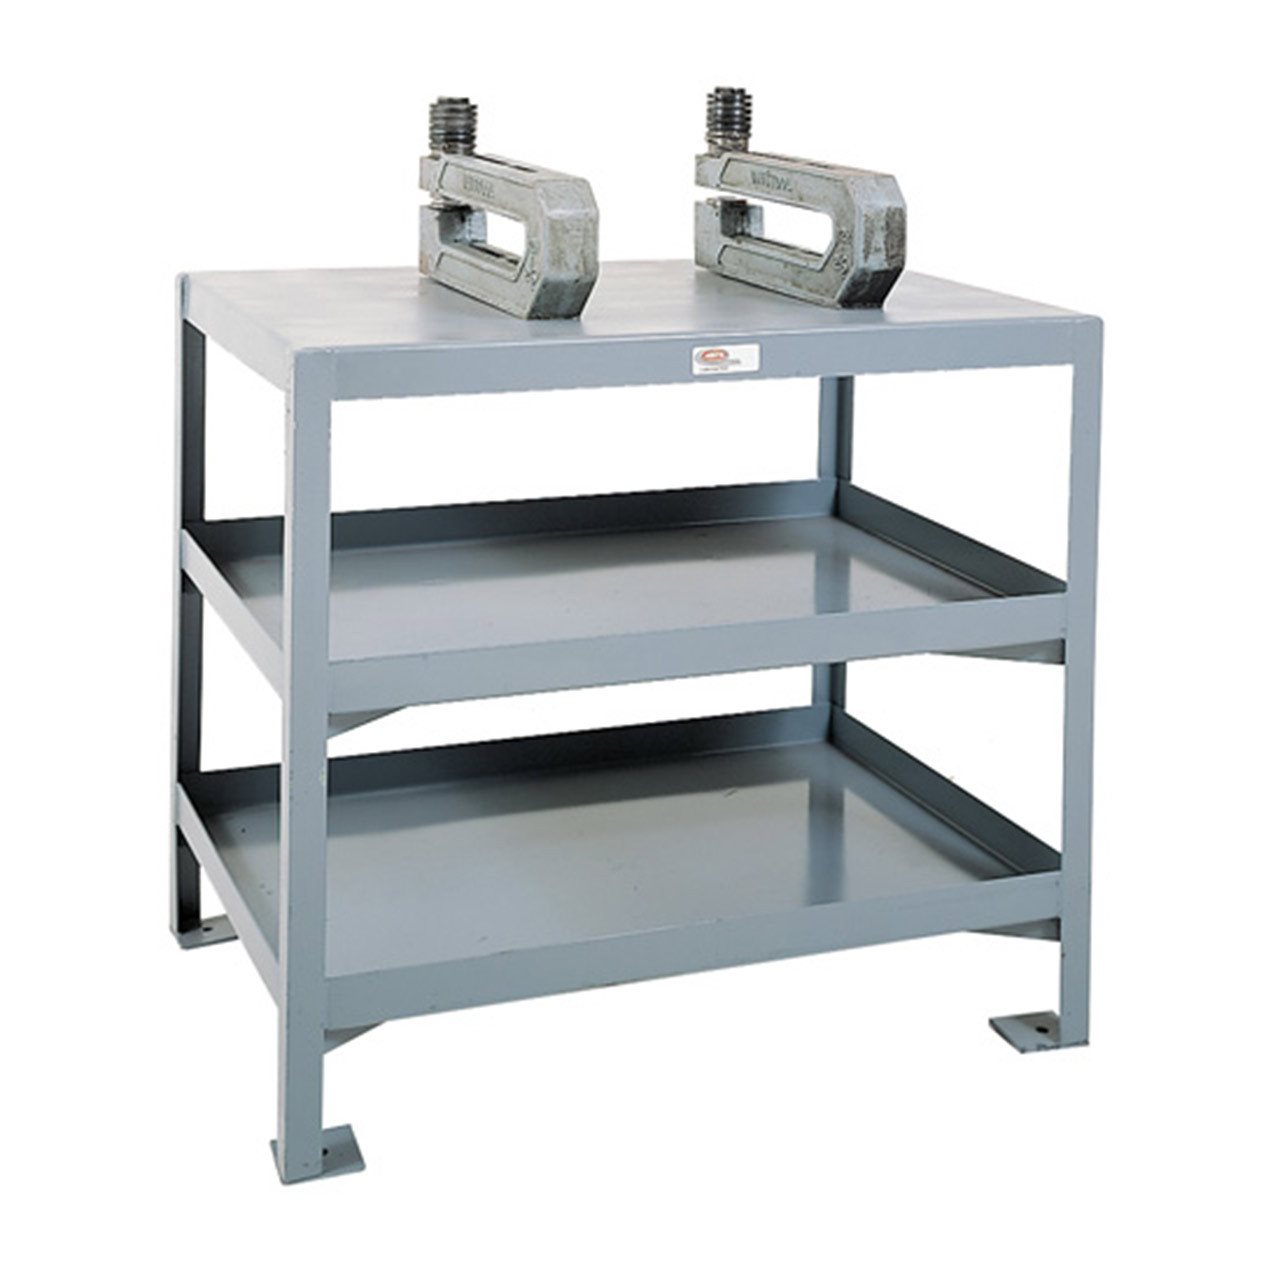 3 Shelf Machine Table